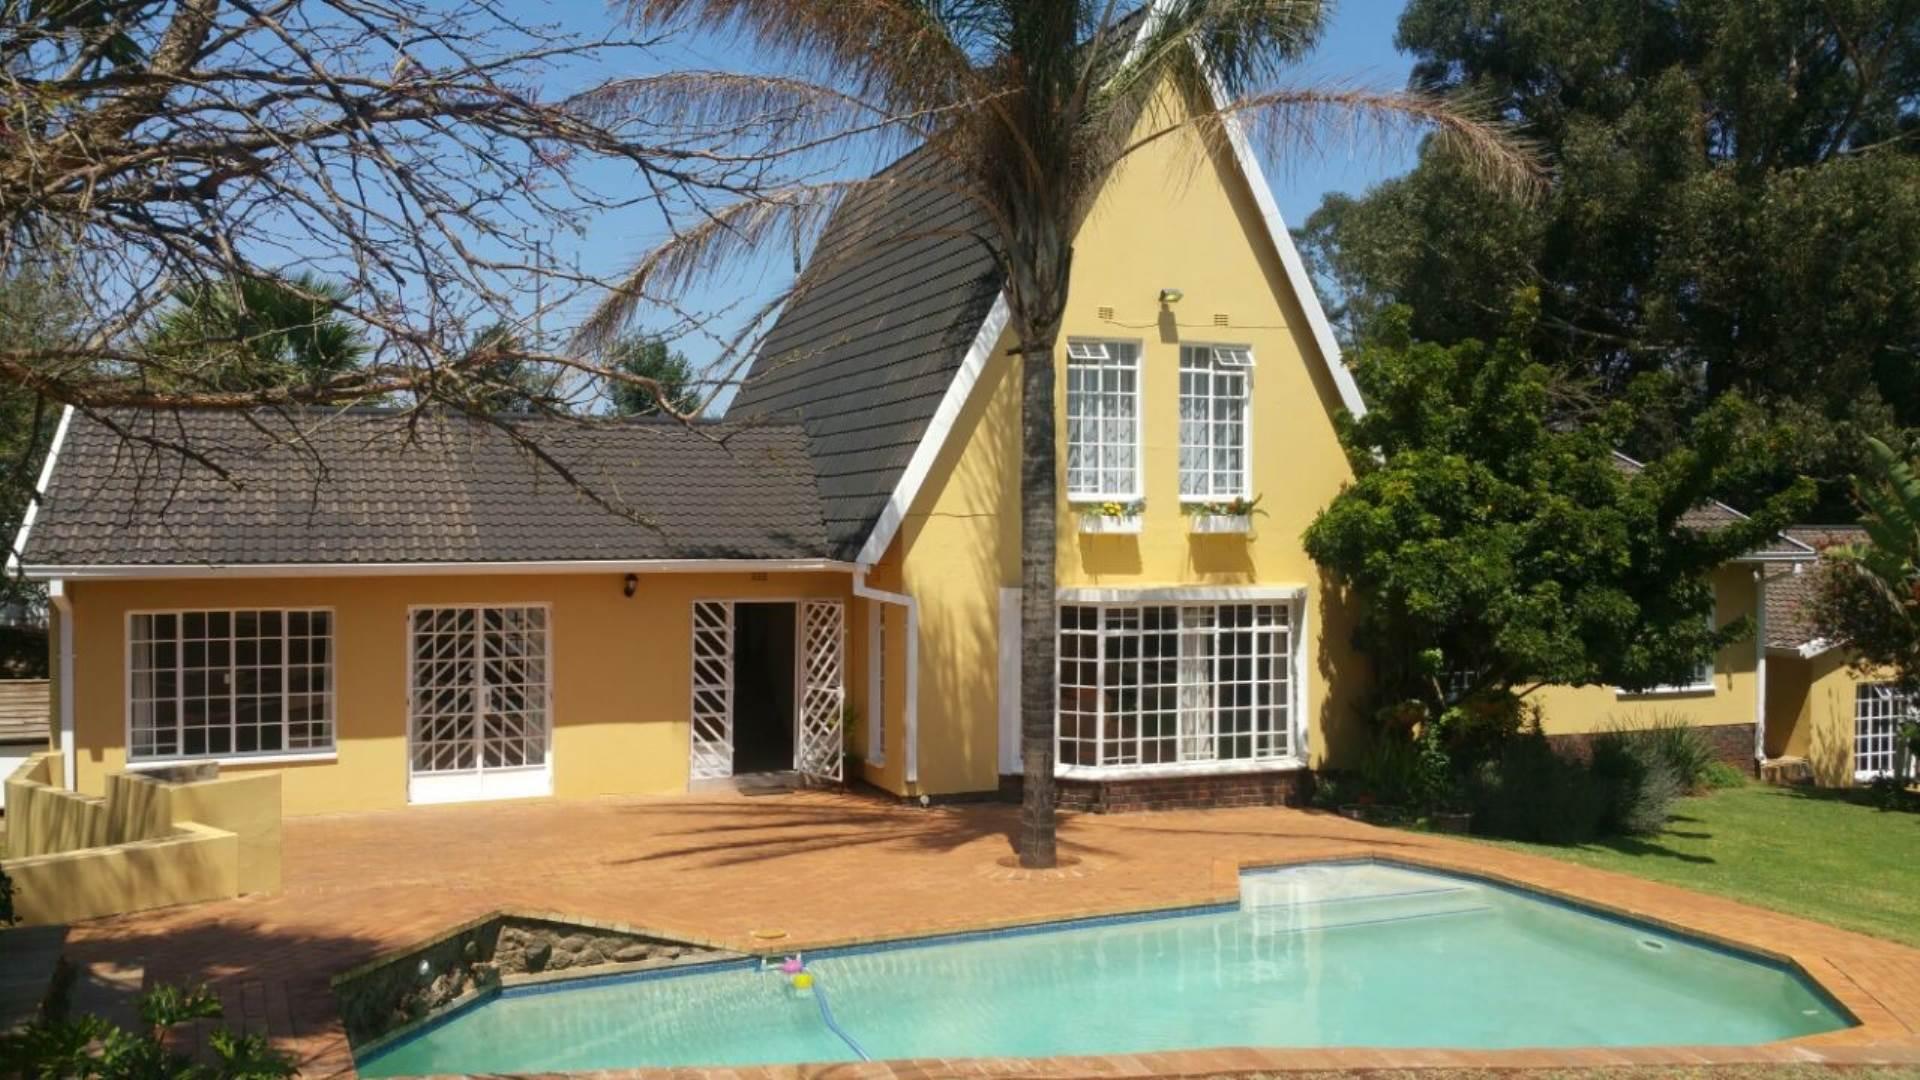 4 BedroomHouse For Sale In Rant En Dal